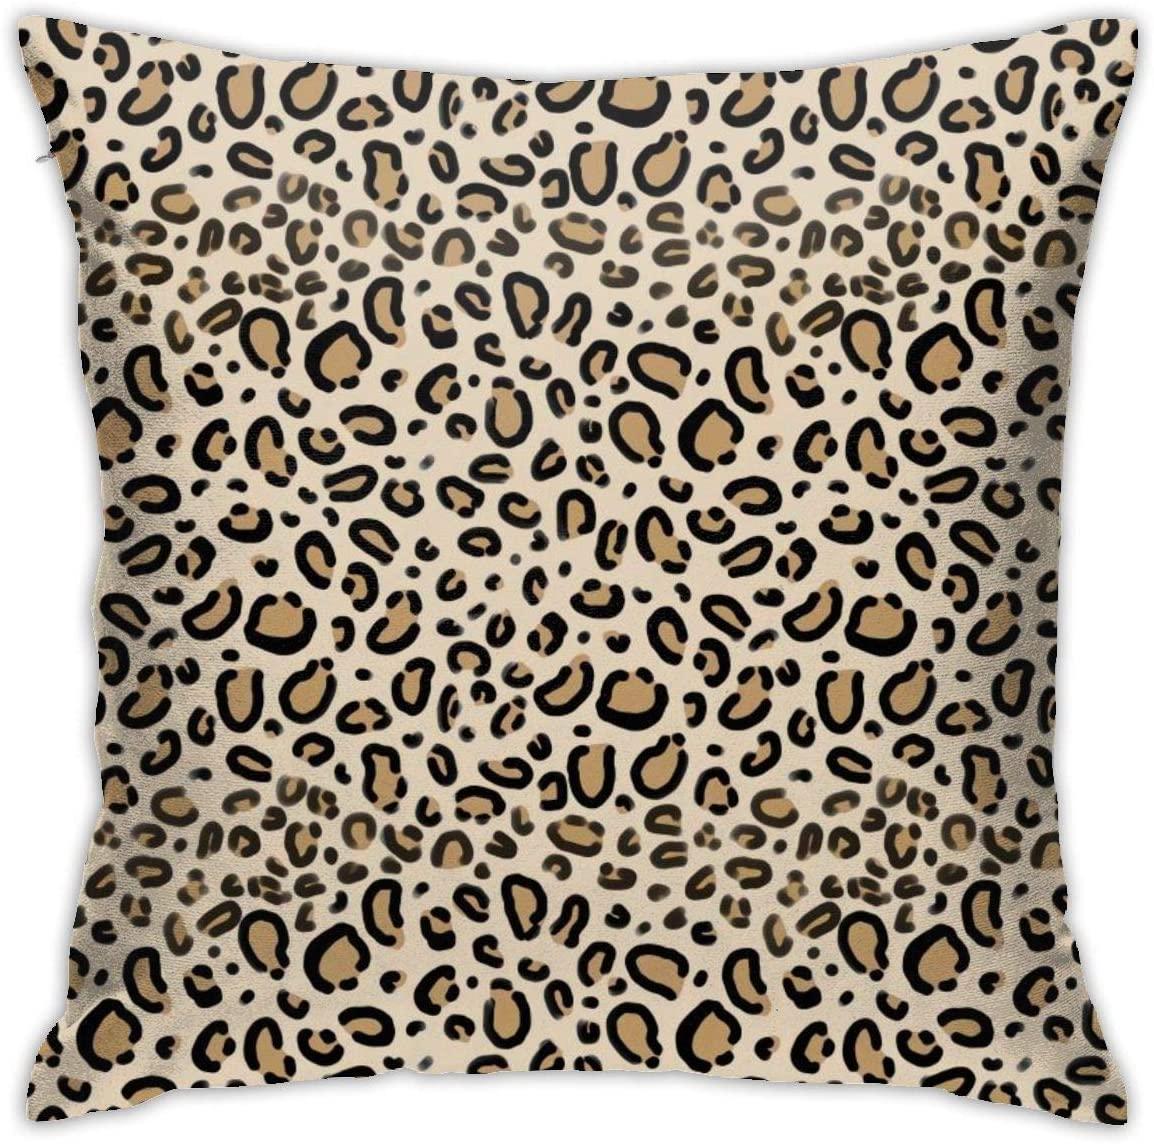 ~ Leopard Print Tan Natural Animal Cheetah Safari Print Throw Pillow Case Soft Pillow Case for Decorative Bedroom/Livingroom/Sofa/Farm House Cushion Covers Couch Pillow 18x18 Inch 45x45 cm